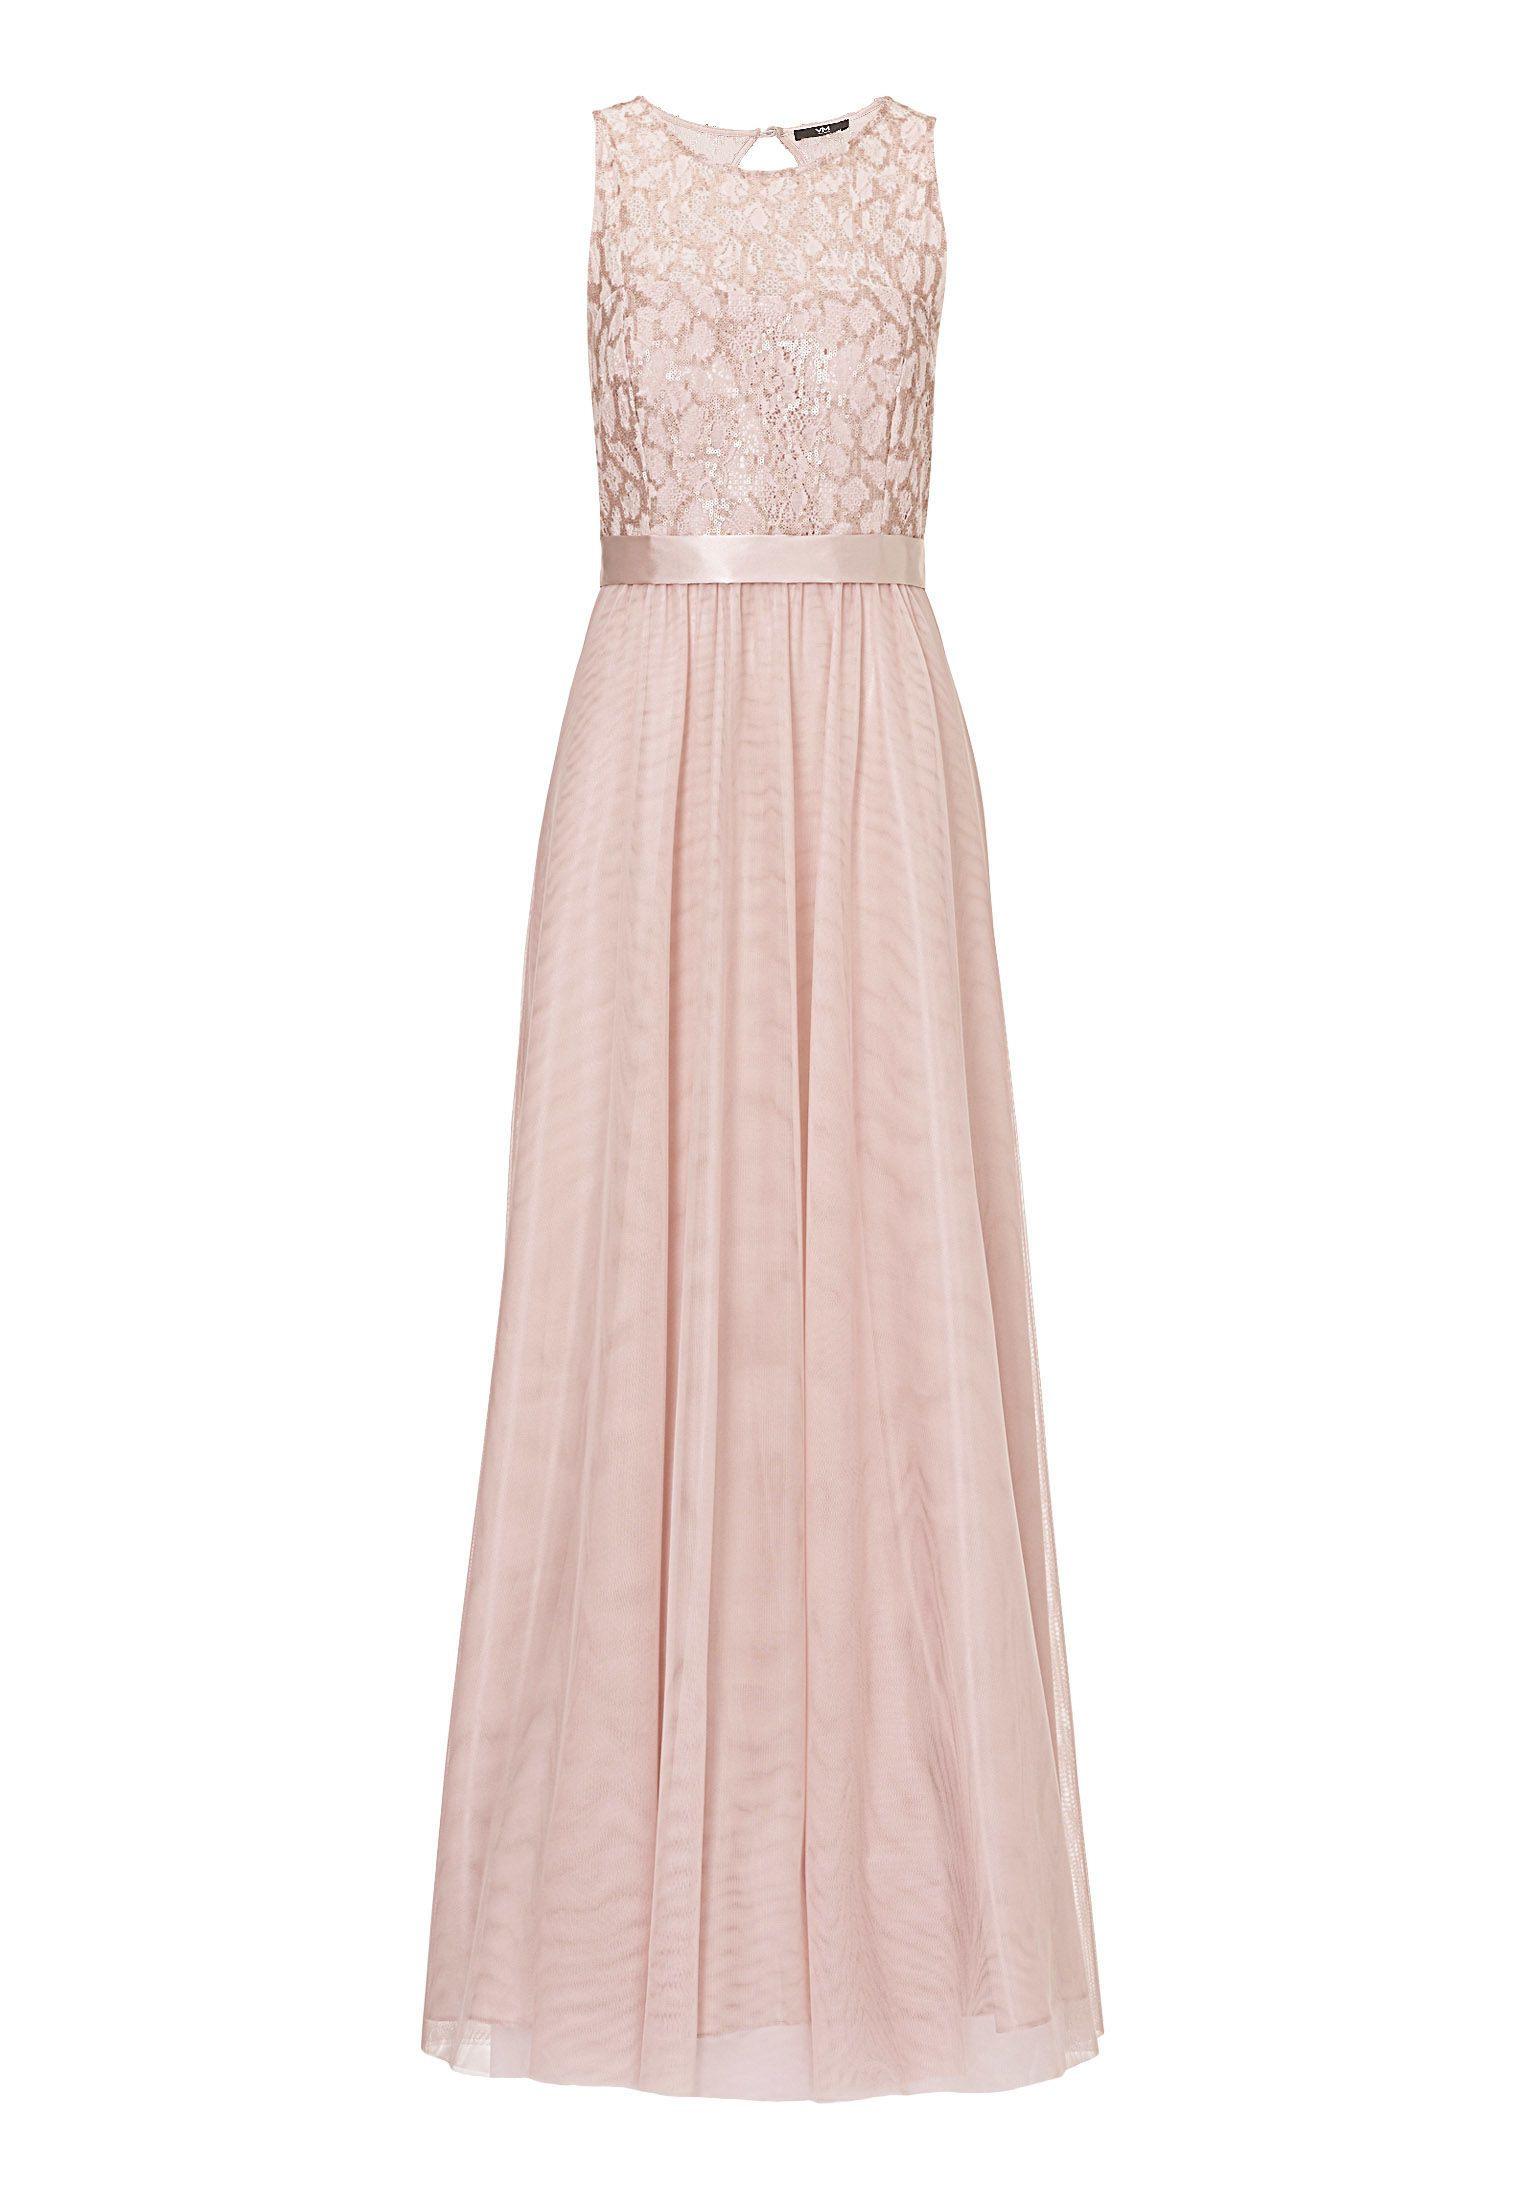 10 Genial Vera Mont Abendkleid Rosa Stylish17 Kreativ Vera Mont Abendkleid Rosa Bester Preis